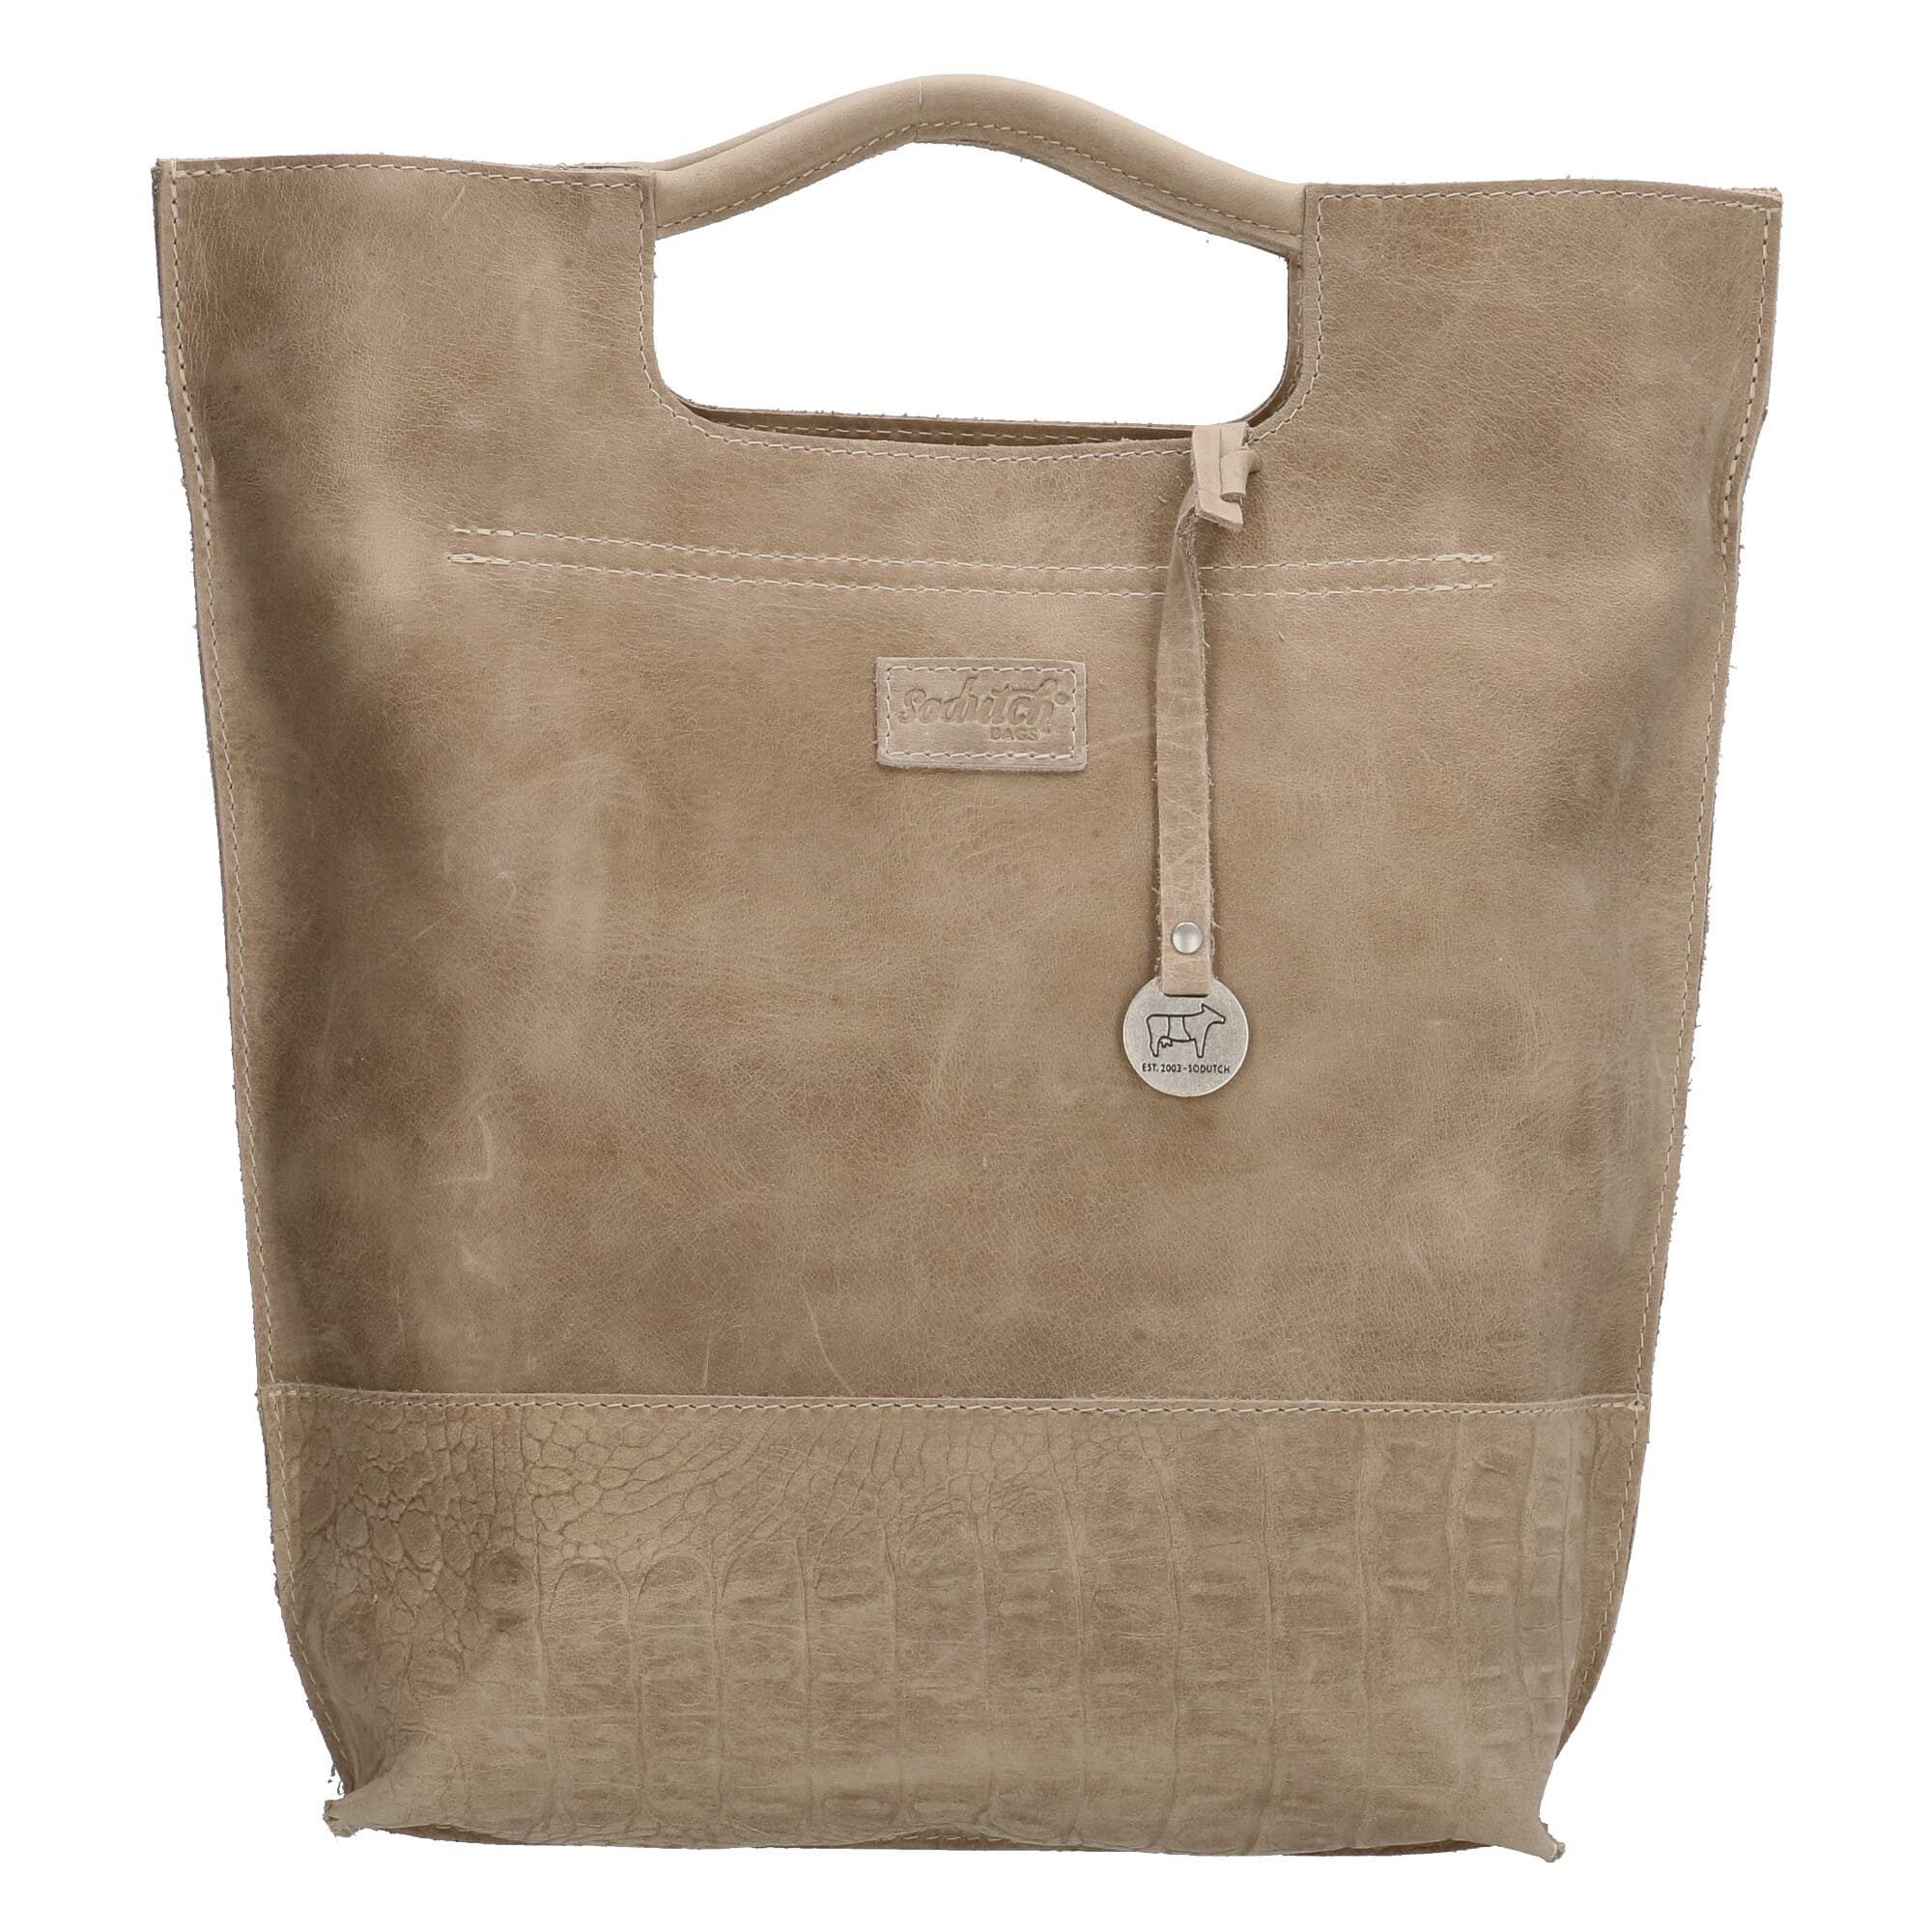 SoDutch Bags Handtas #08 Taupe